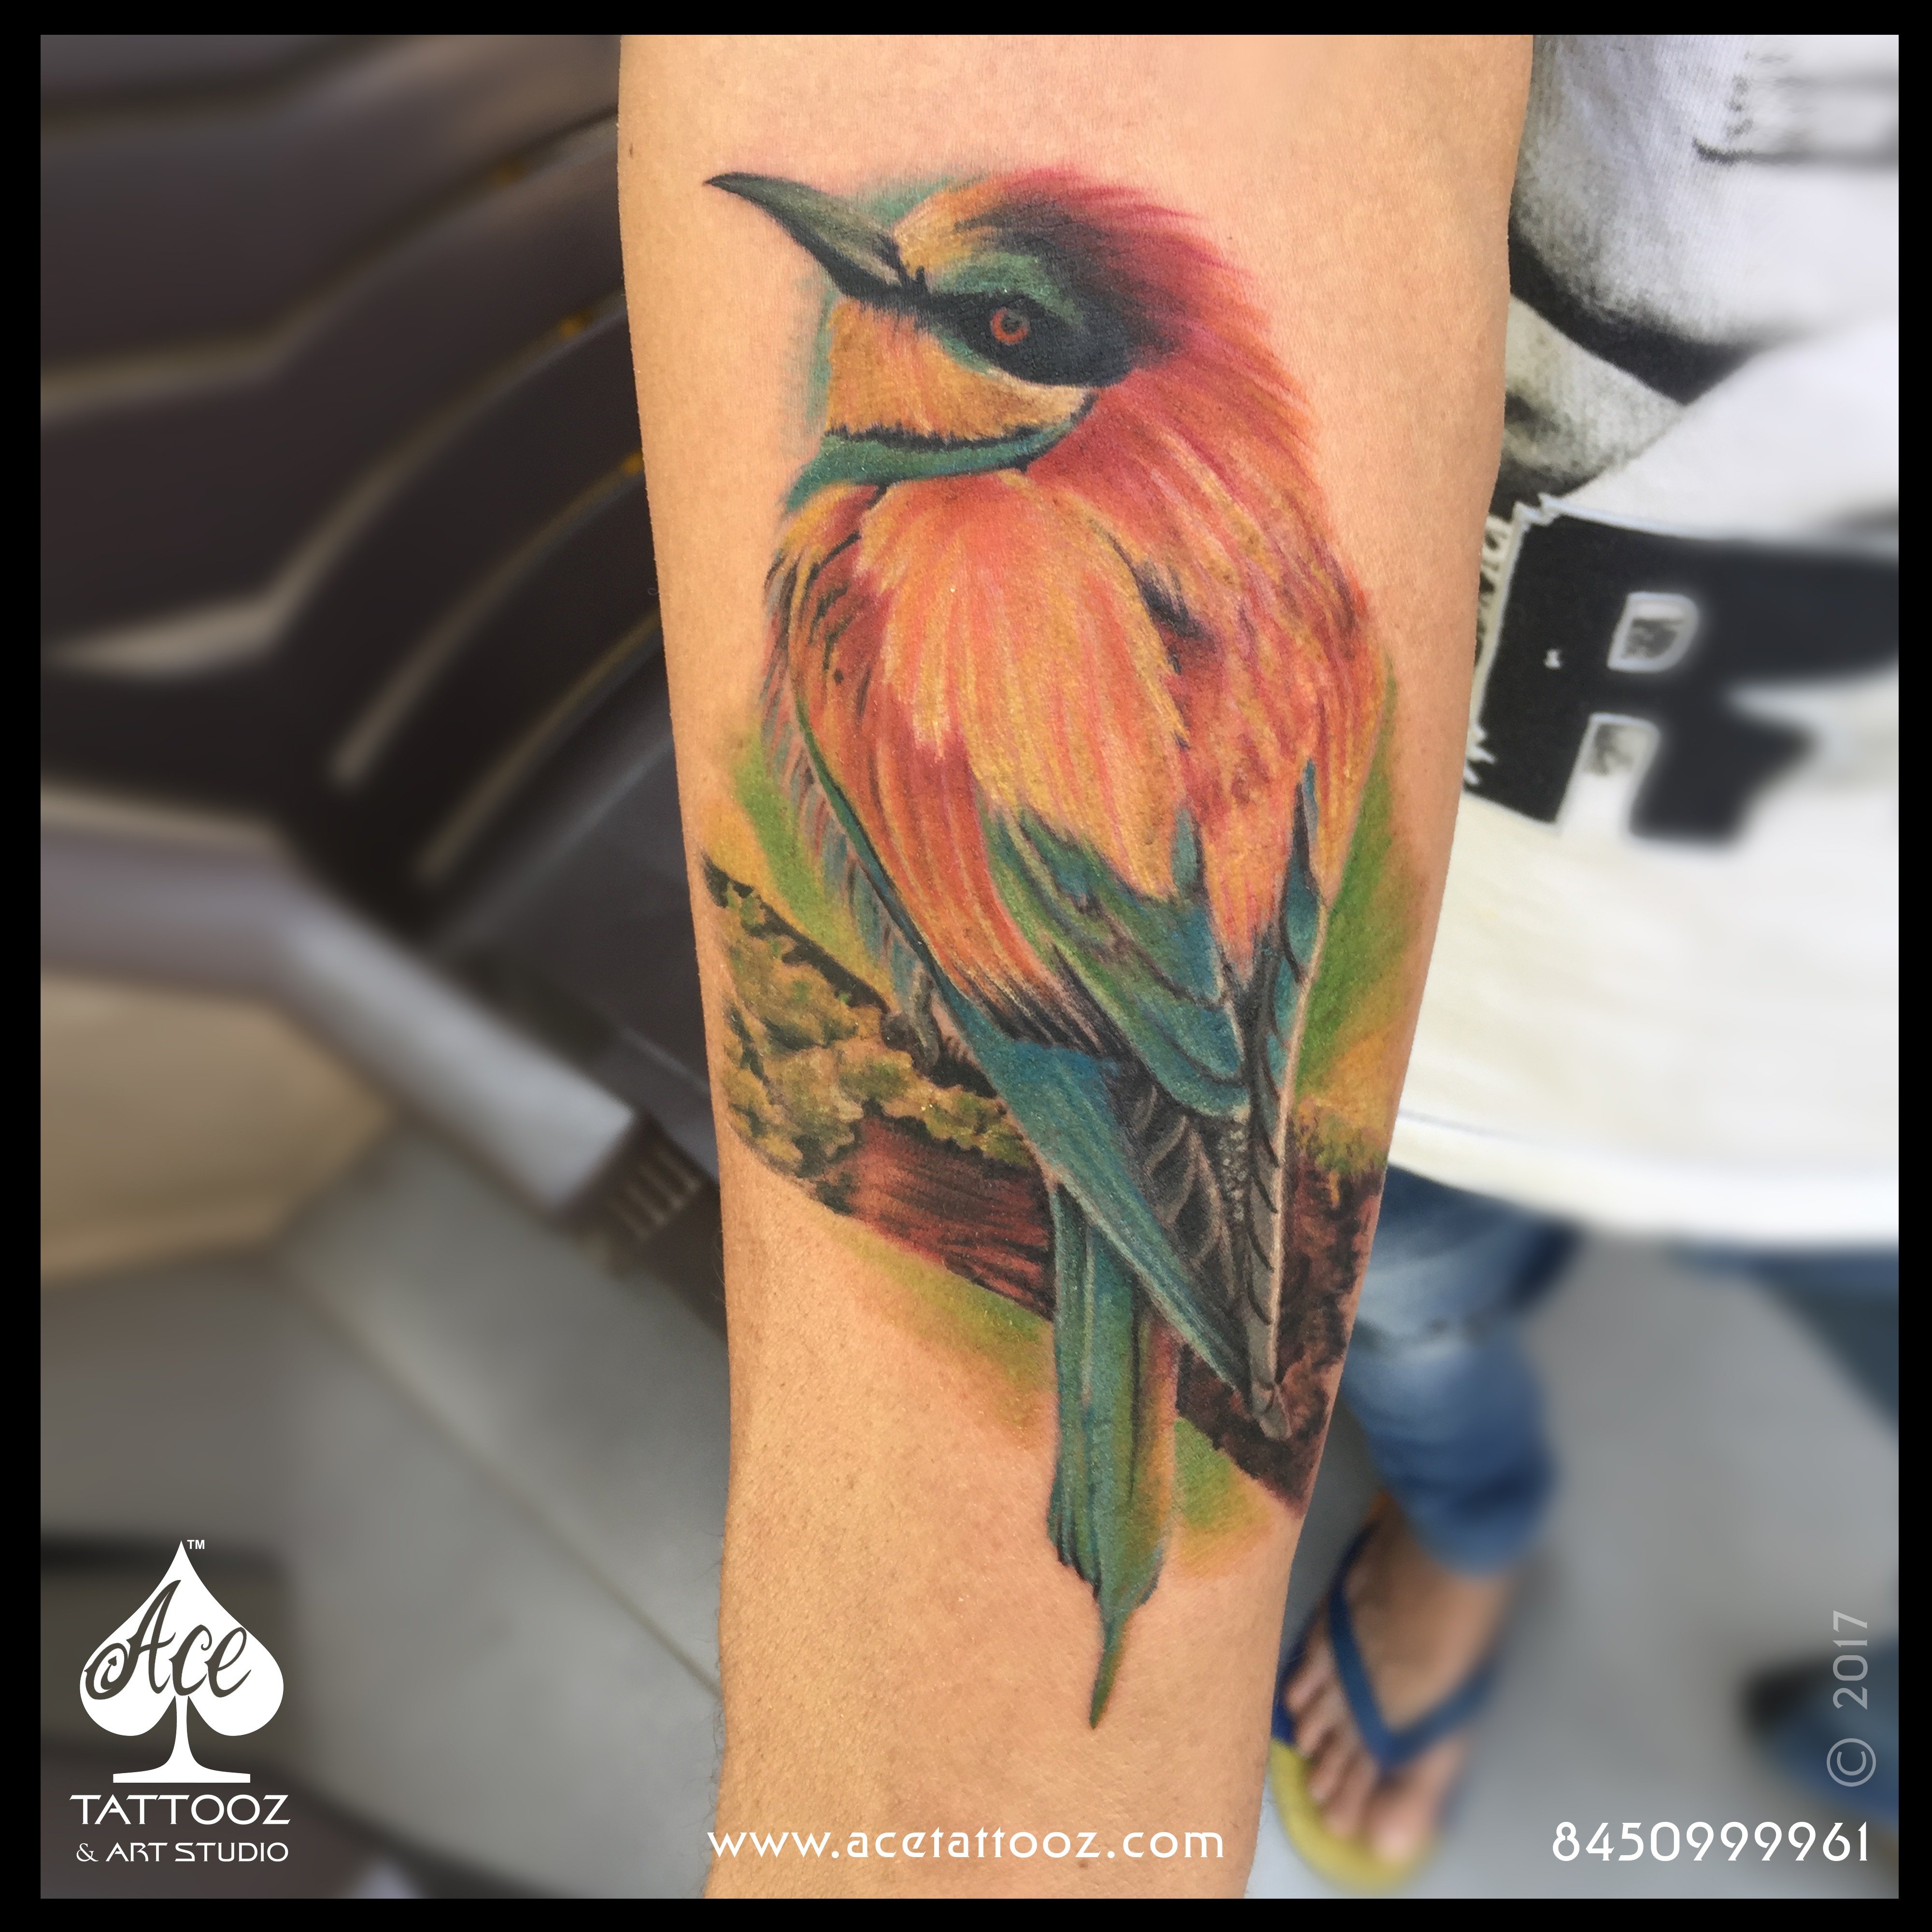 Colourful Bird Tattoo